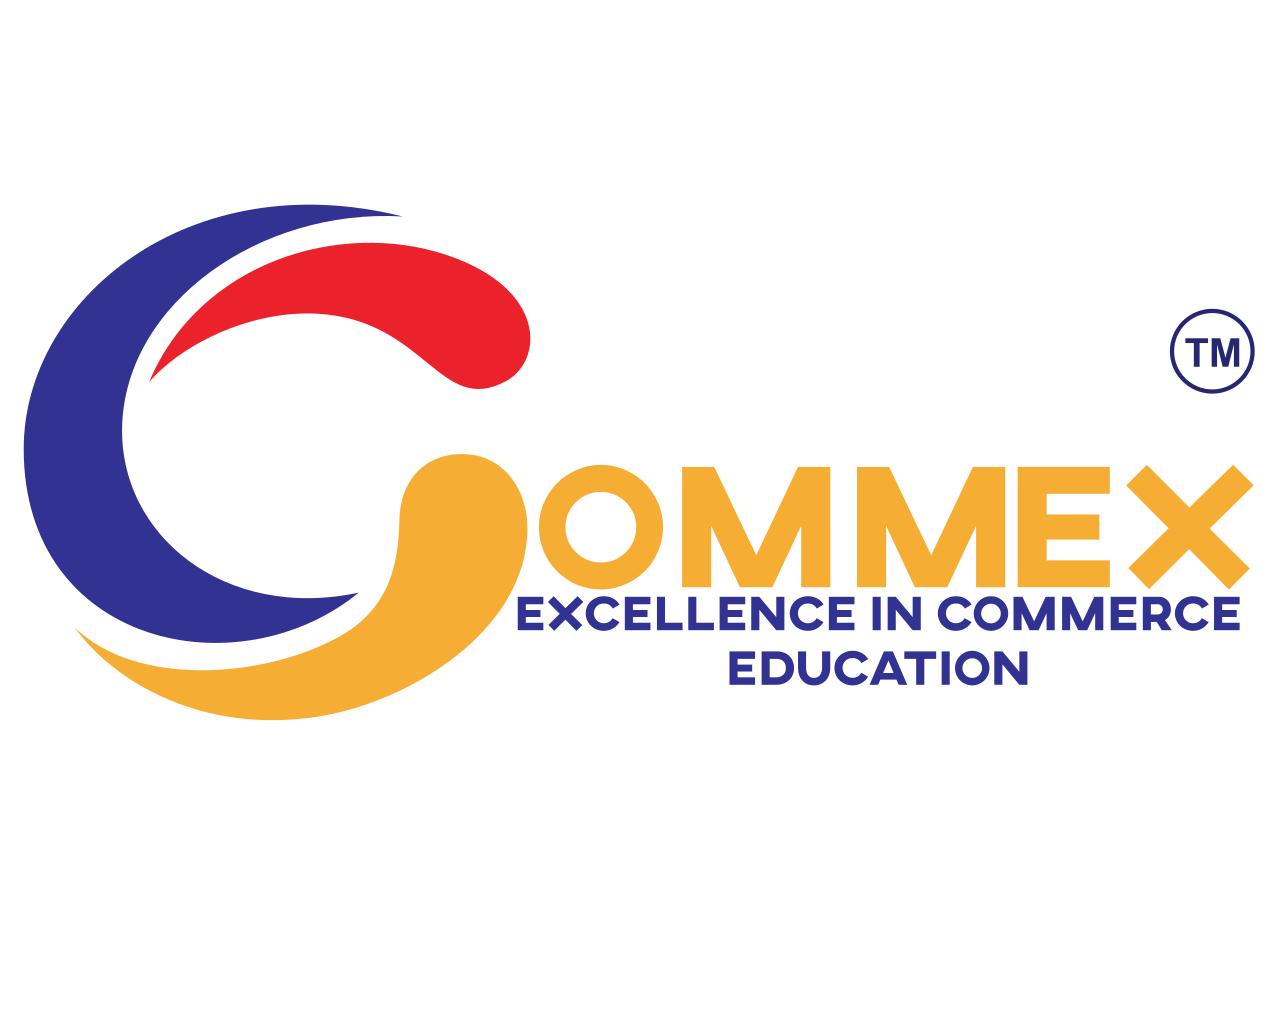 Commerce Institute by C.A. Preeti Maheshwari